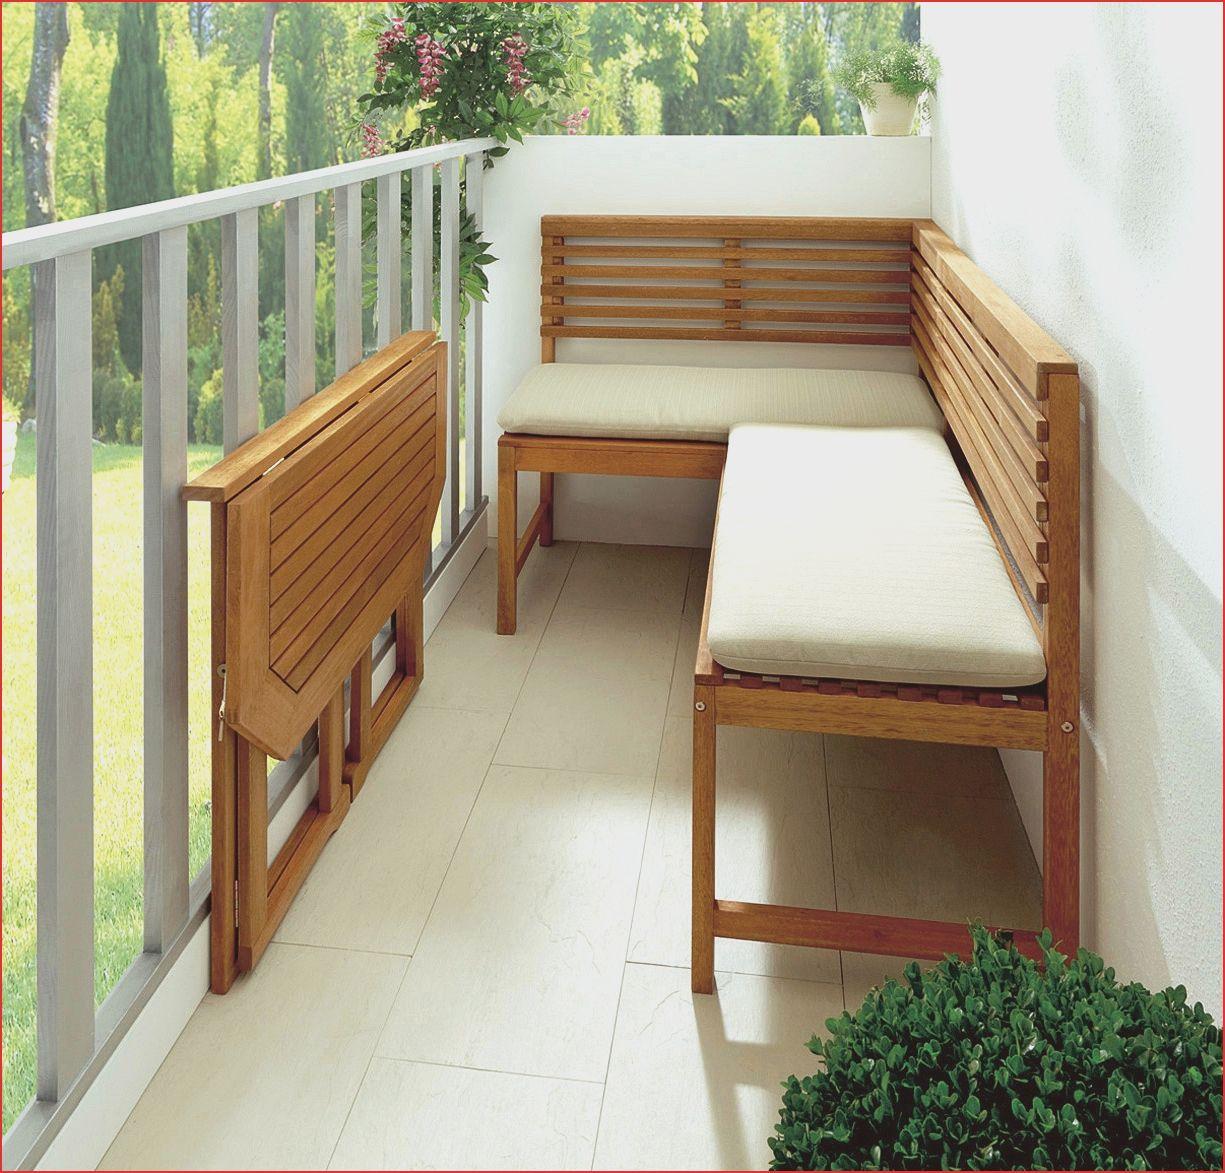 Garten Design 28 Tolle Ikea Klapptisch Balkon O65p Klapptisch